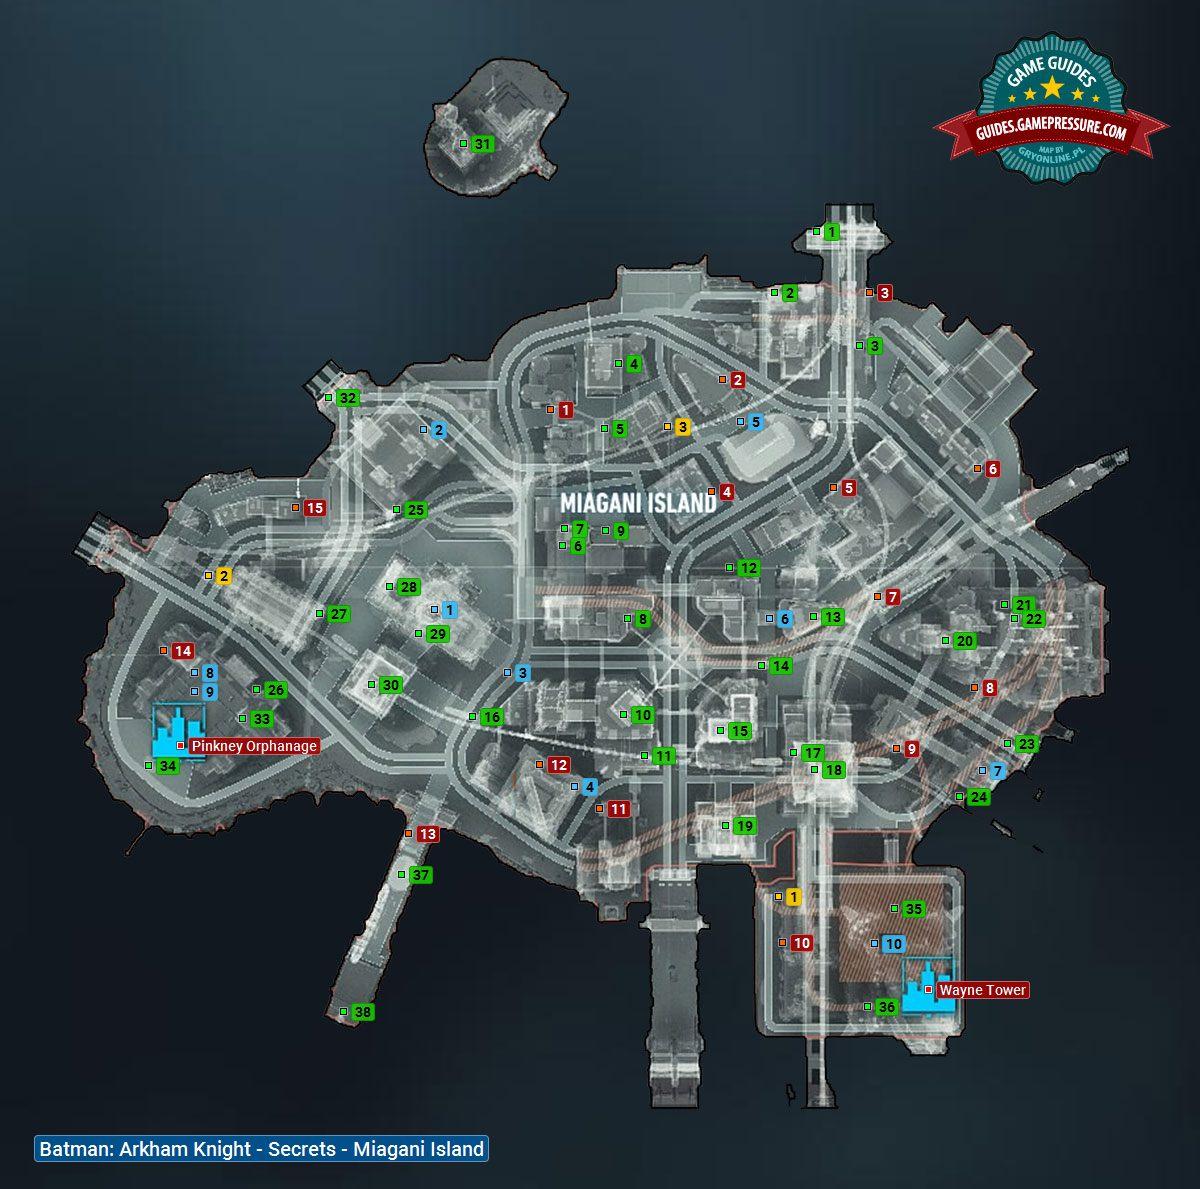 Batman Arkham Knight Map Map of Miagani Island | Collectibles   Miagani Island   Batman